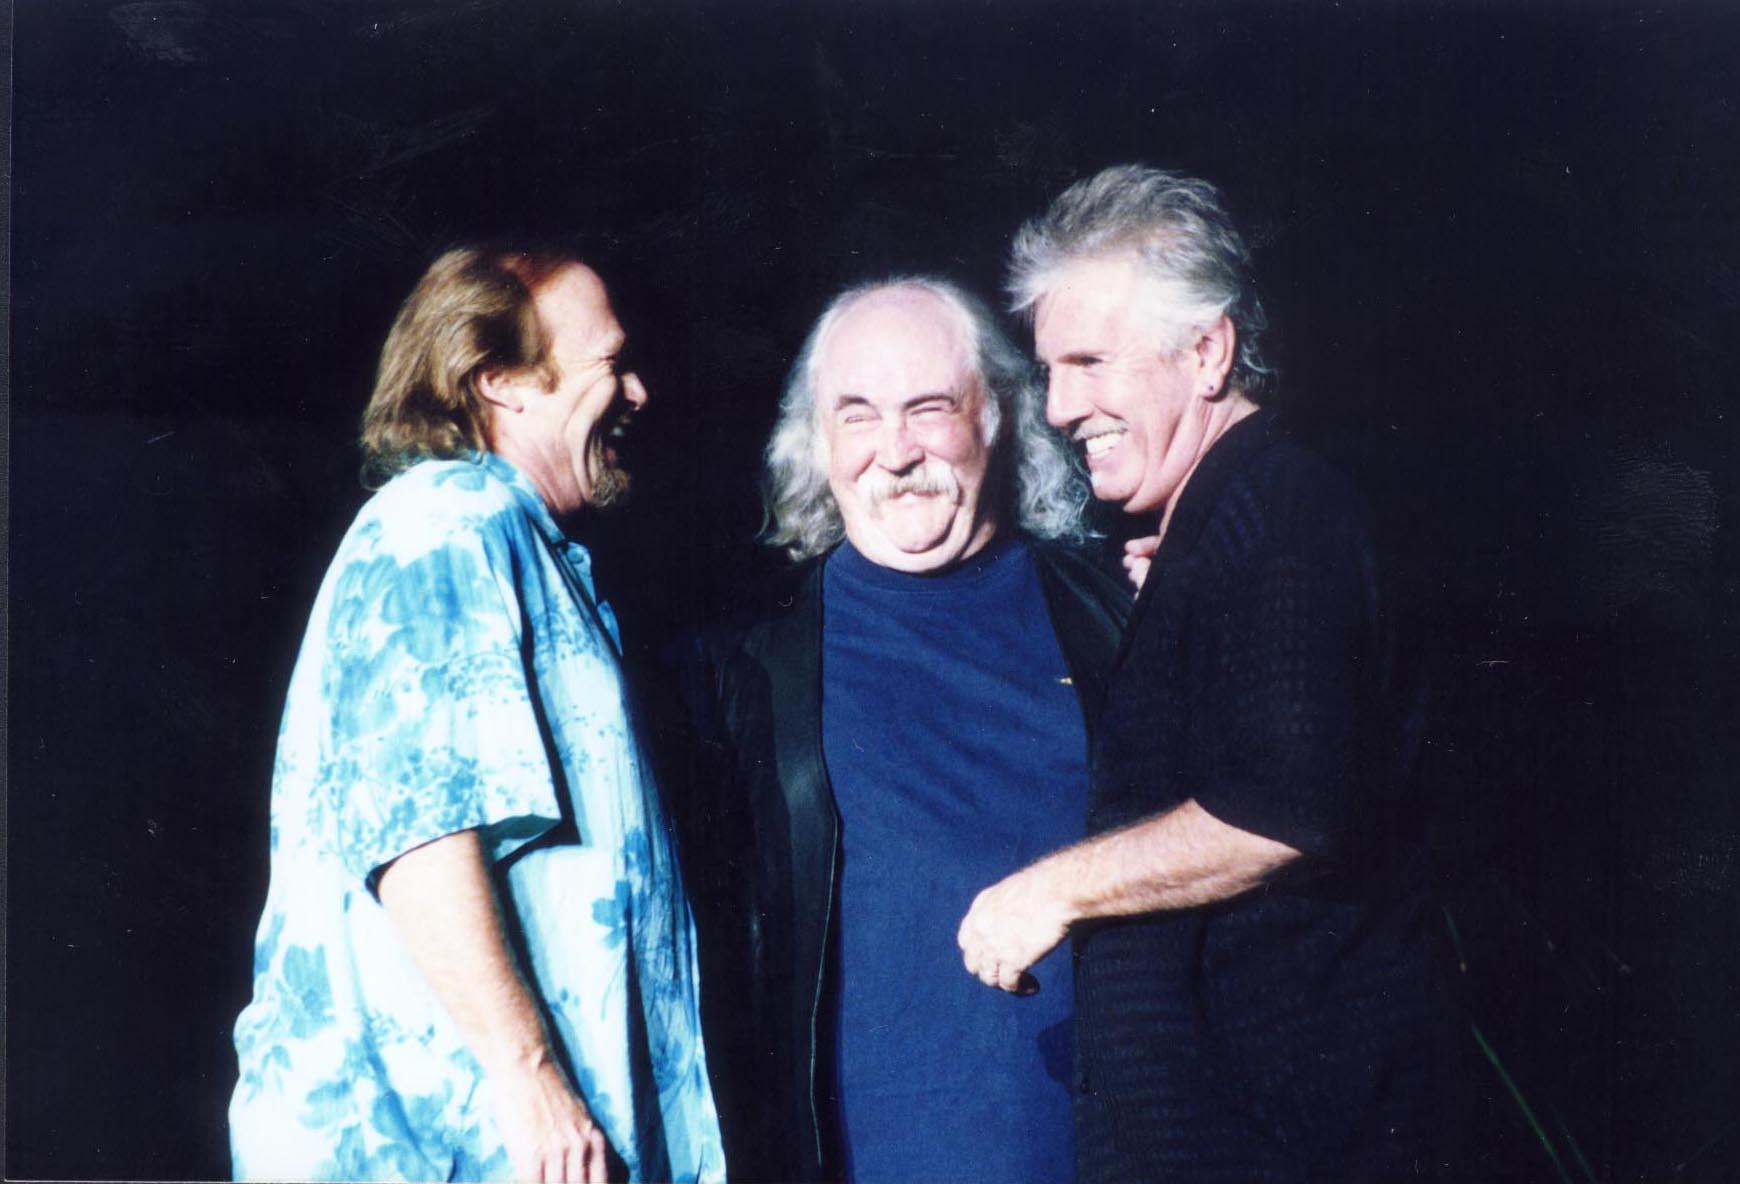 Stephen Stills, David Crosby and Graham Nash. Photo by RD Mathers